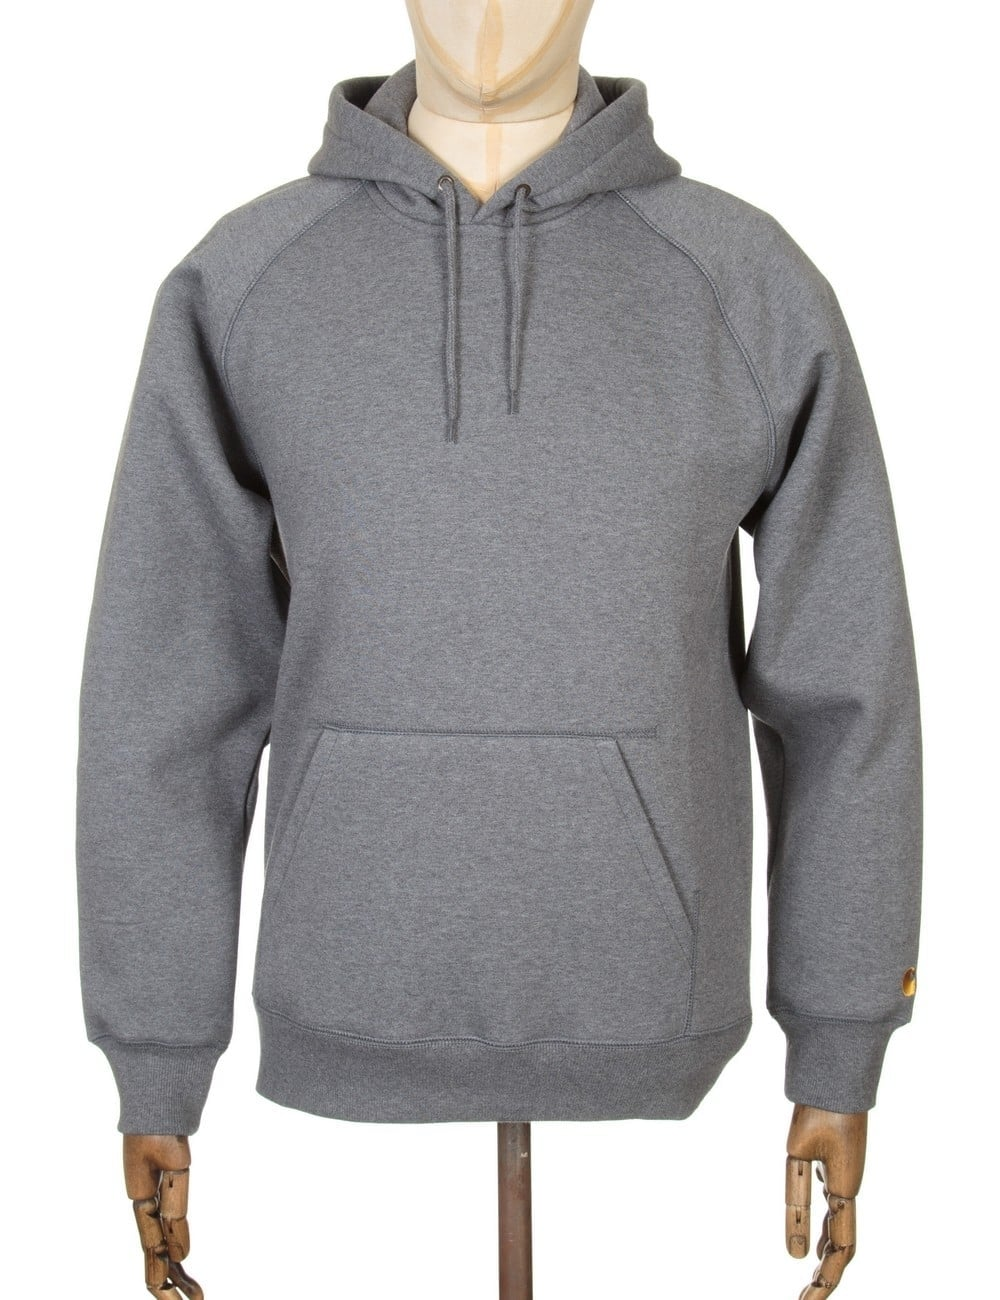 aea46cf76f9 Carhartt WIP Hooded Chase Sweatshirt - Dark Grey Heather - Clothing ...